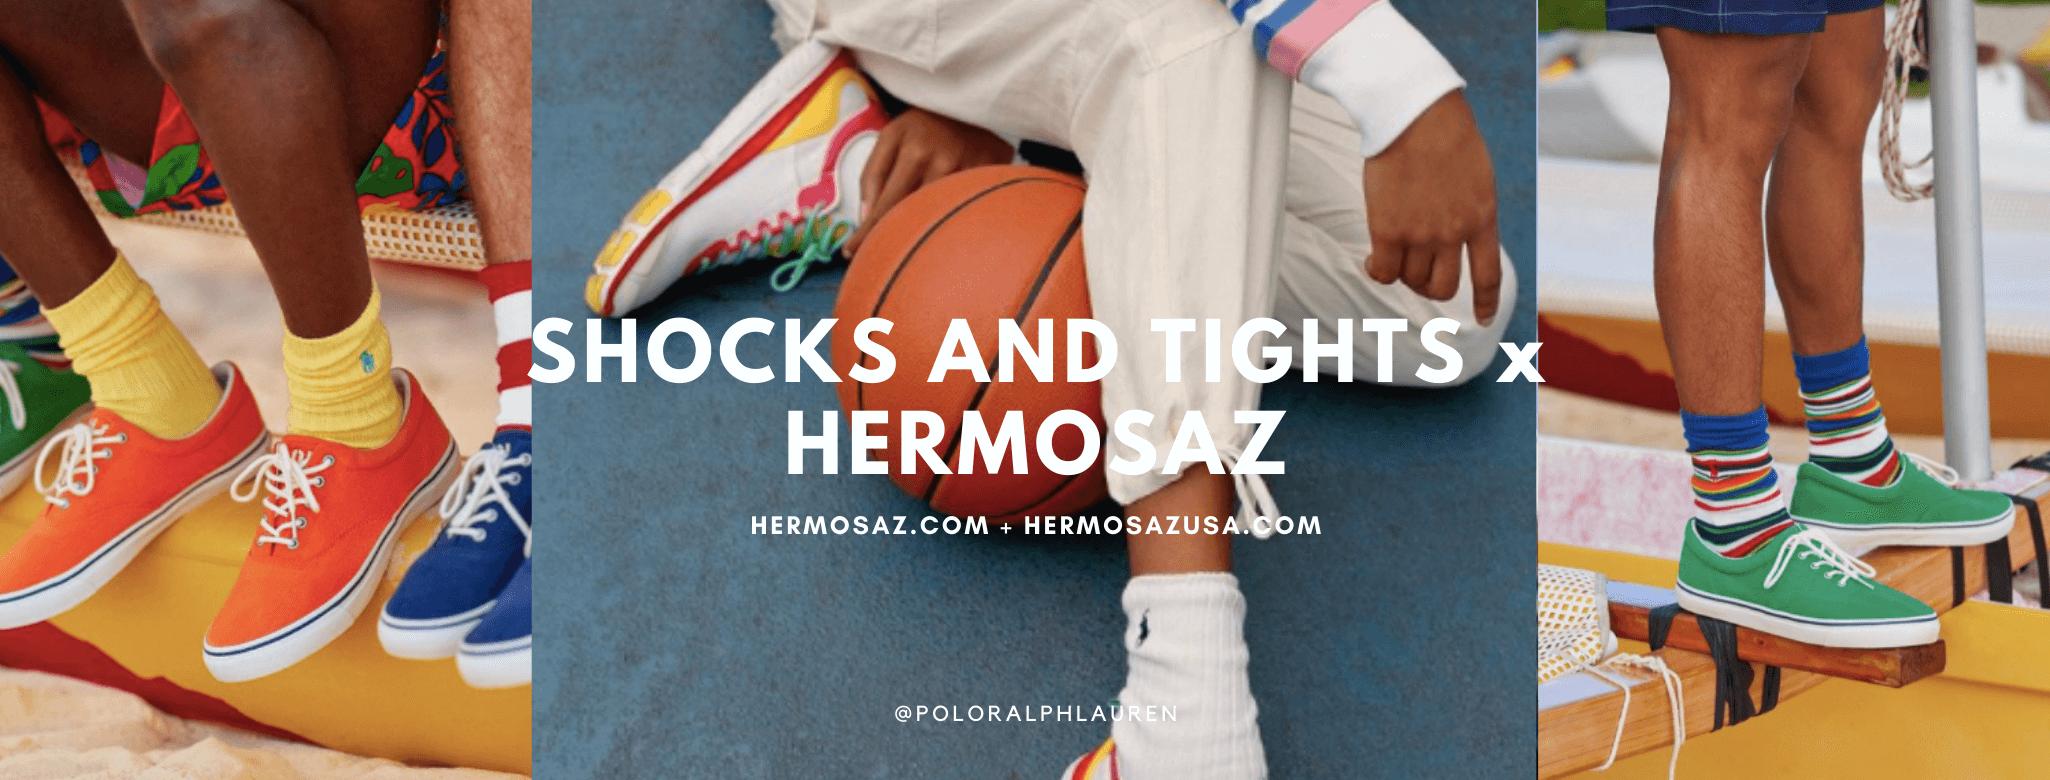 Shocks and tights x Hermosaz